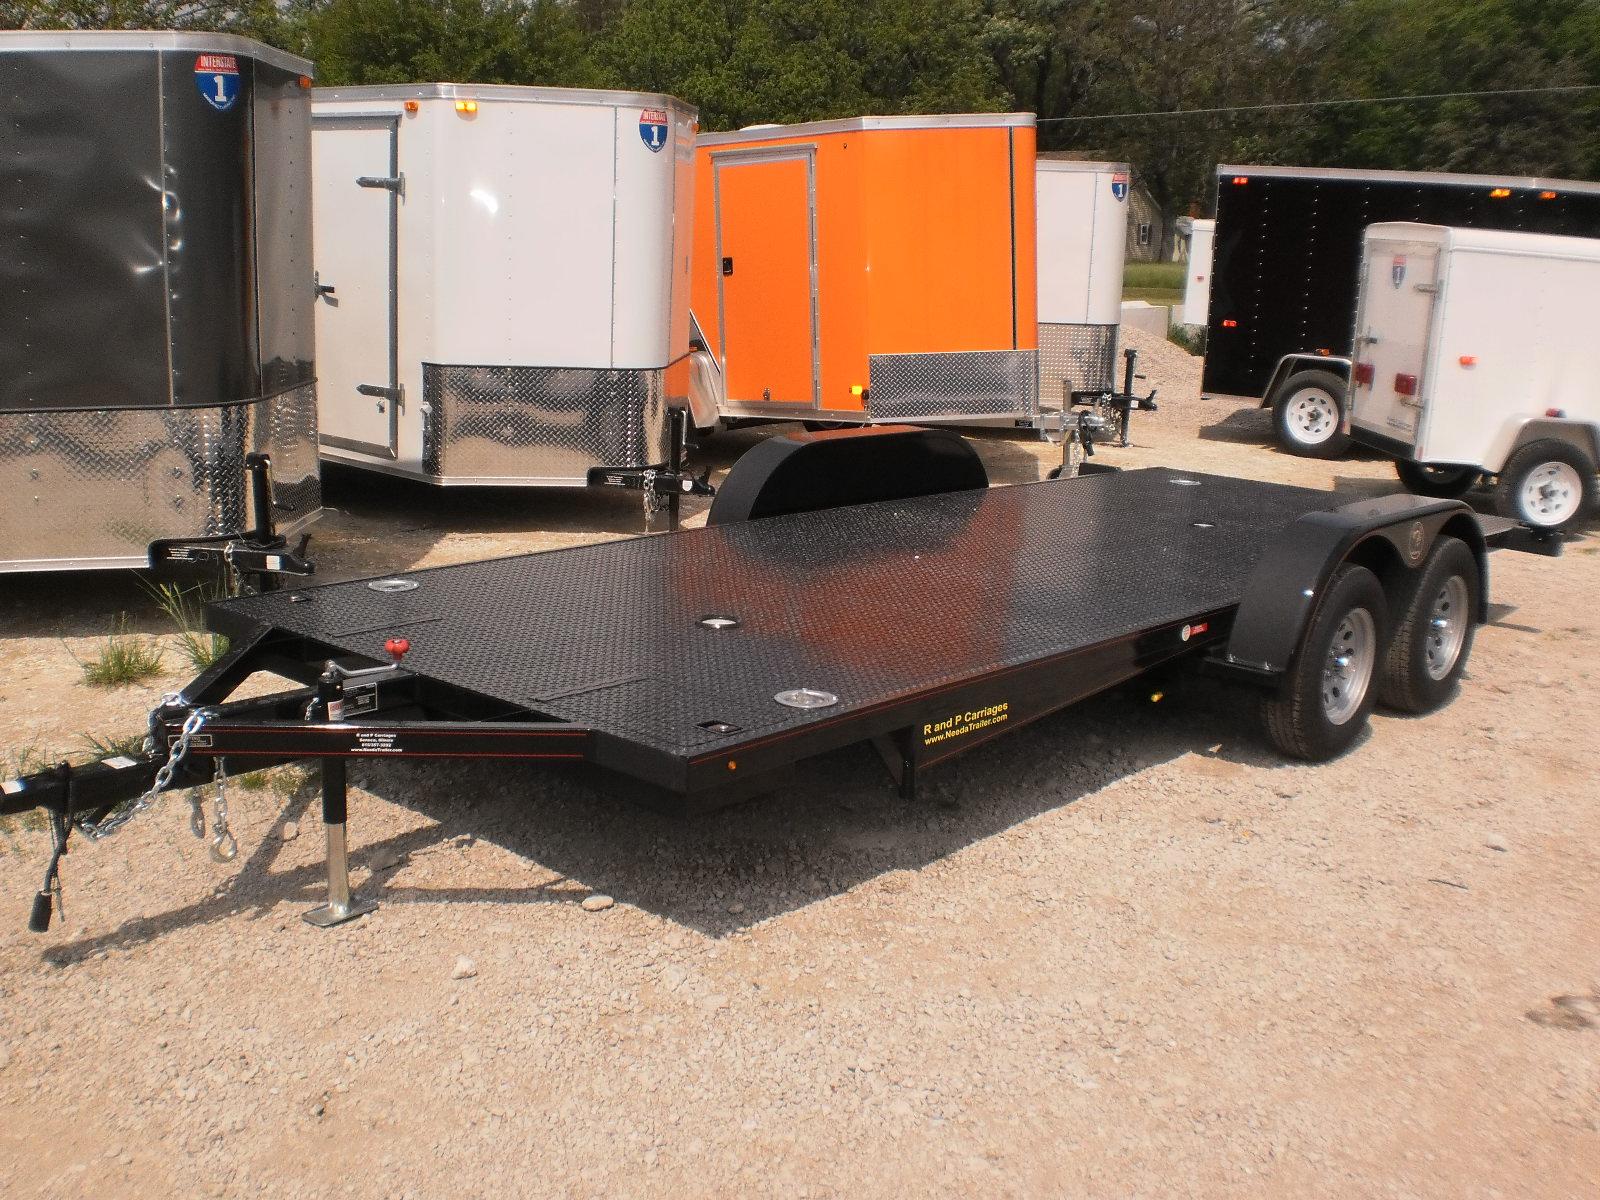 Texas Kwik Load 7000 Trailers Wiring Diagrams For Tilt Car Hauler Trailer Plans 7 X 18 Sloans Roll Back In Seneca